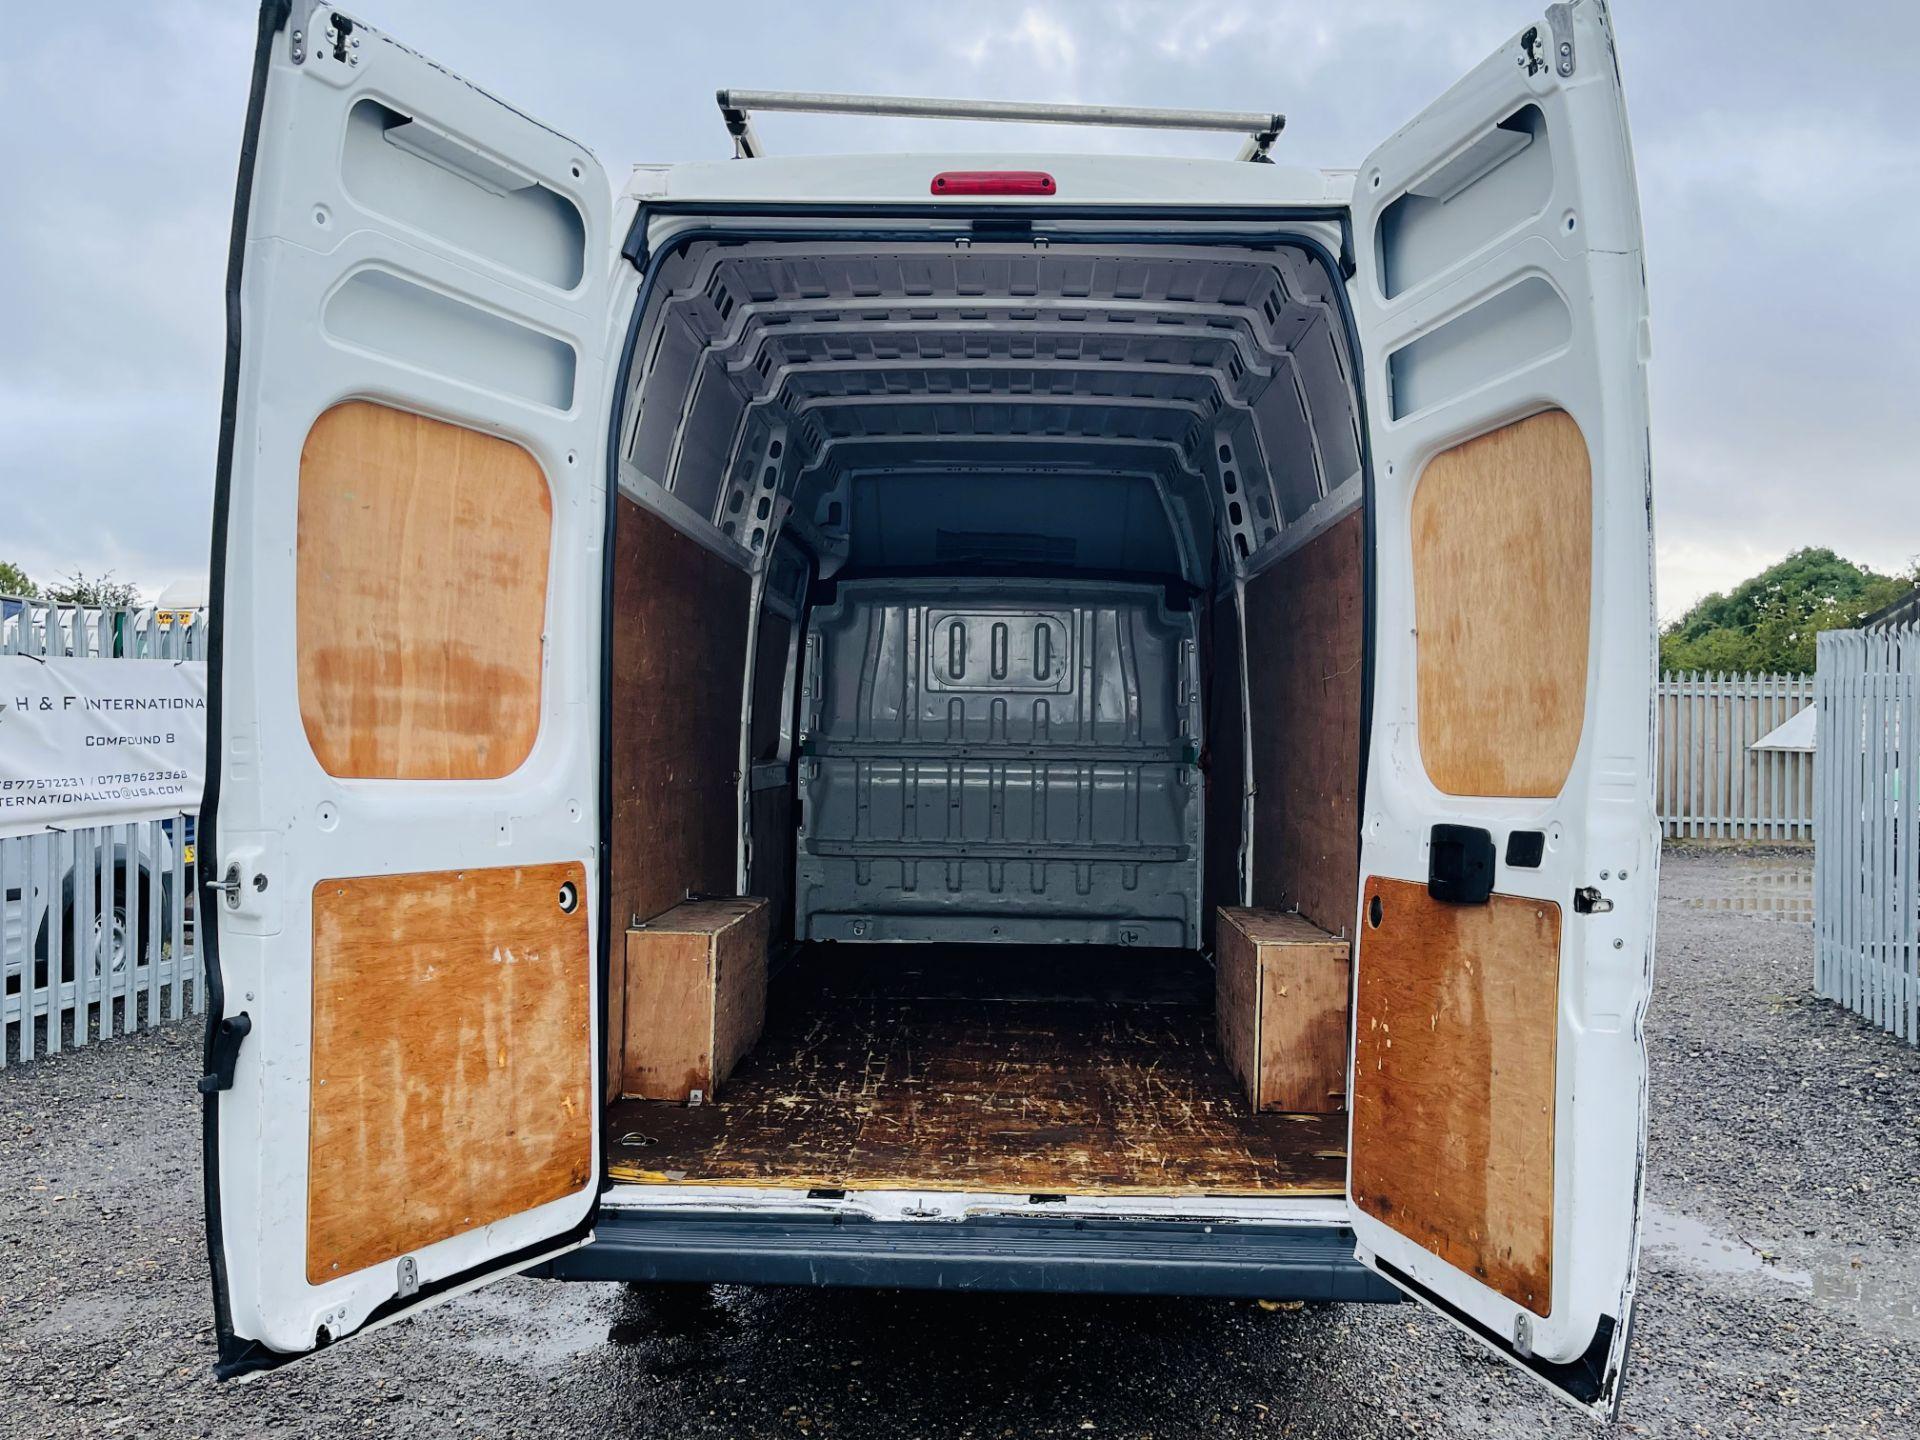 ** ON SALE ** Peugeot Boxer 2.0 BlueHDI L4 H3 2017 '66 Reg' Panel Van - LCV - Euro 6b ULEZ Compliant - Image 12 of 18